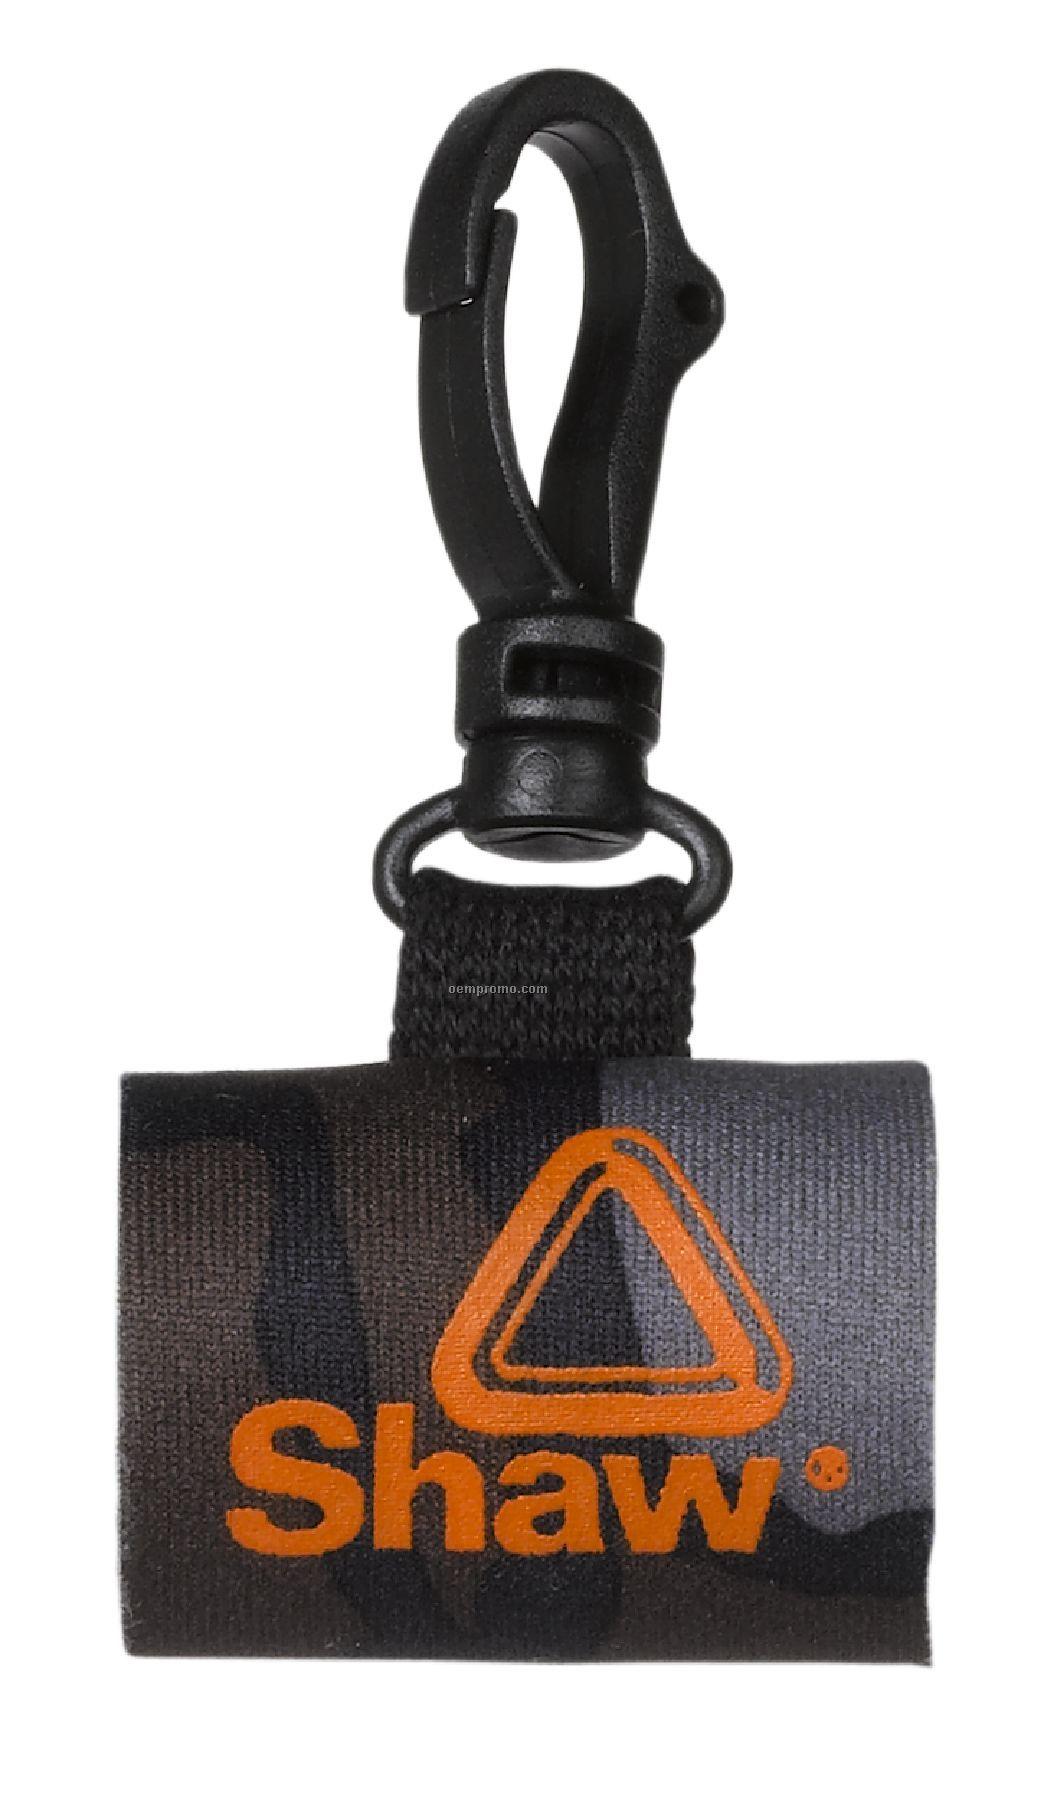 0.5 Oz. Neoprene Bottle Sleeve With Swivel Snap Hook